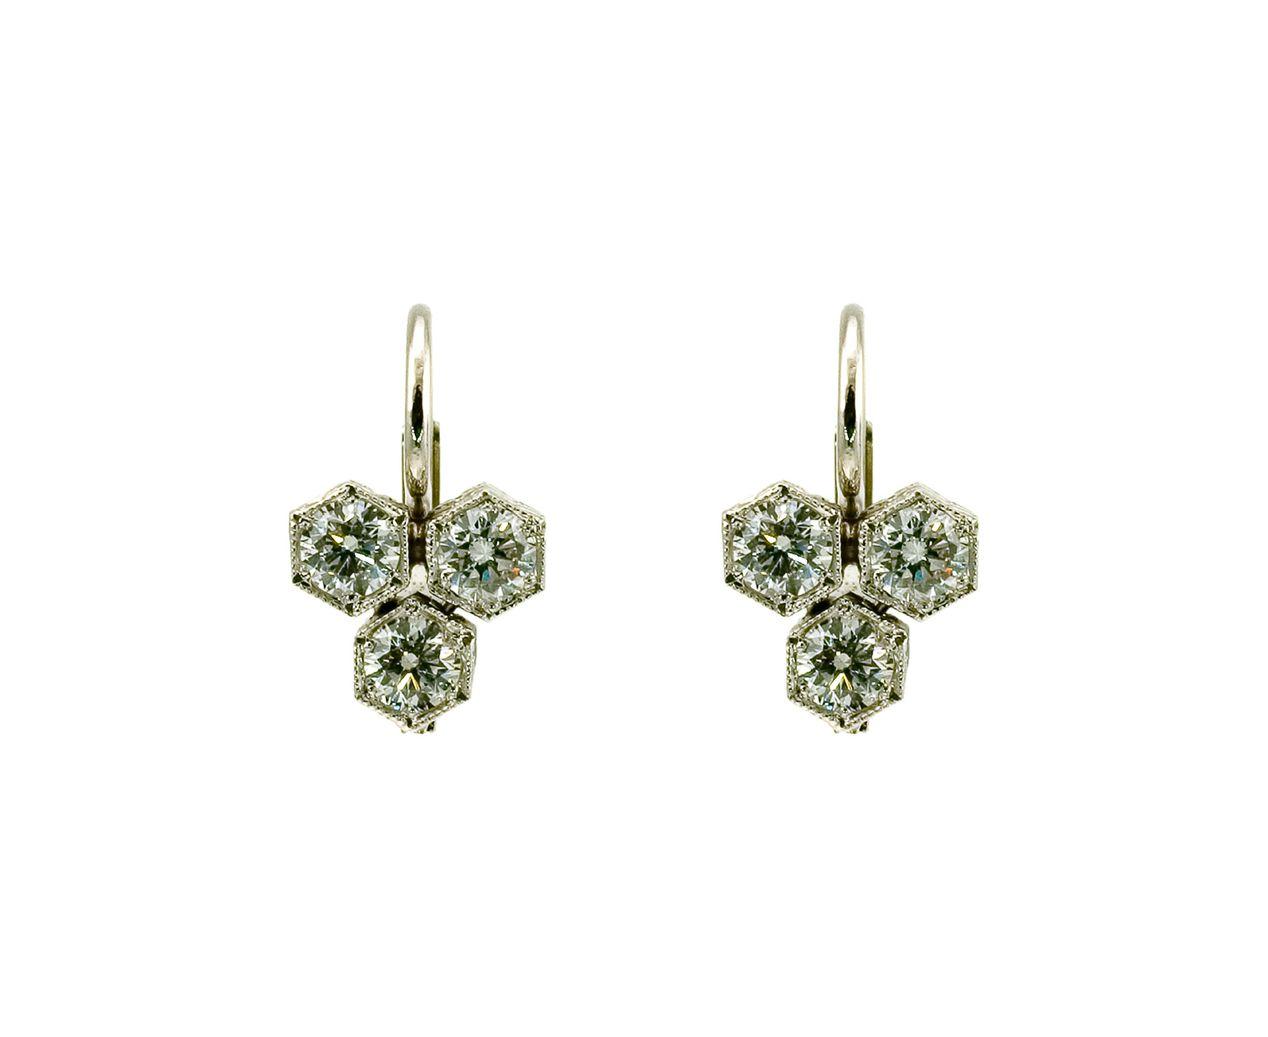 Cathy Waterman Triple Hexagonal Earrings In Dangles At Twistonline